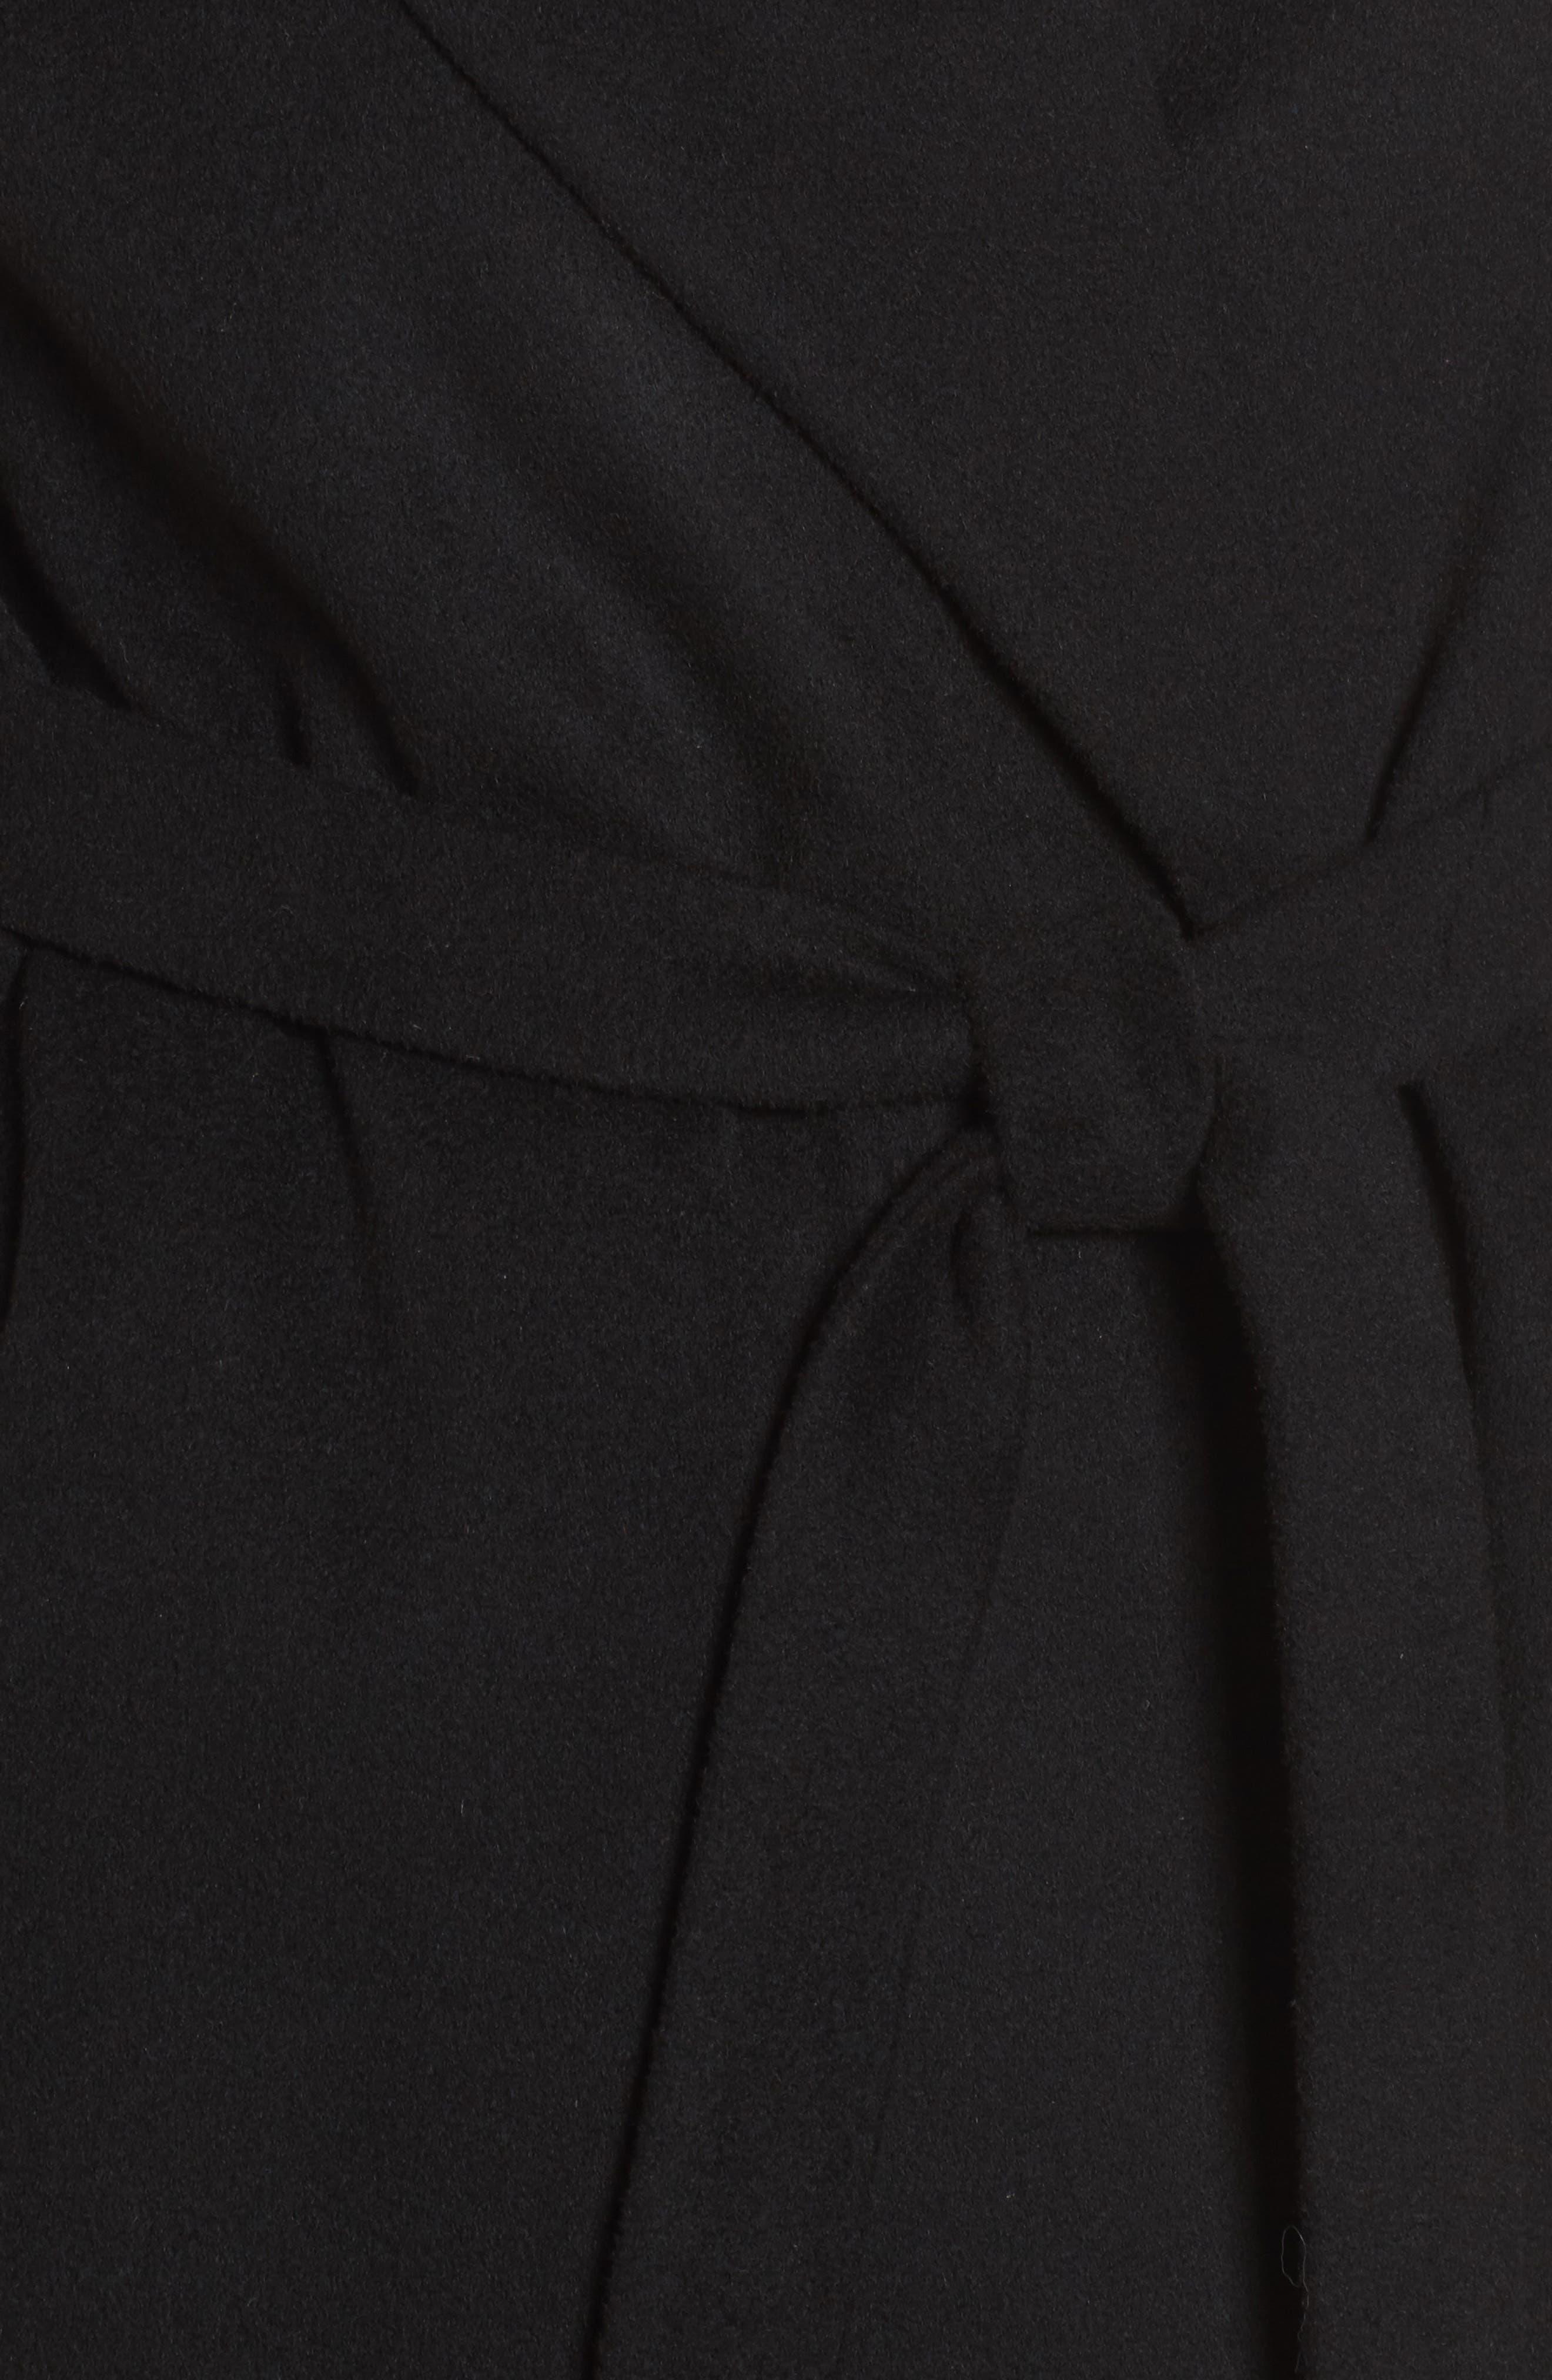 Belted Duster Coat,                             Alternate thumbnail 5, color,                             Black